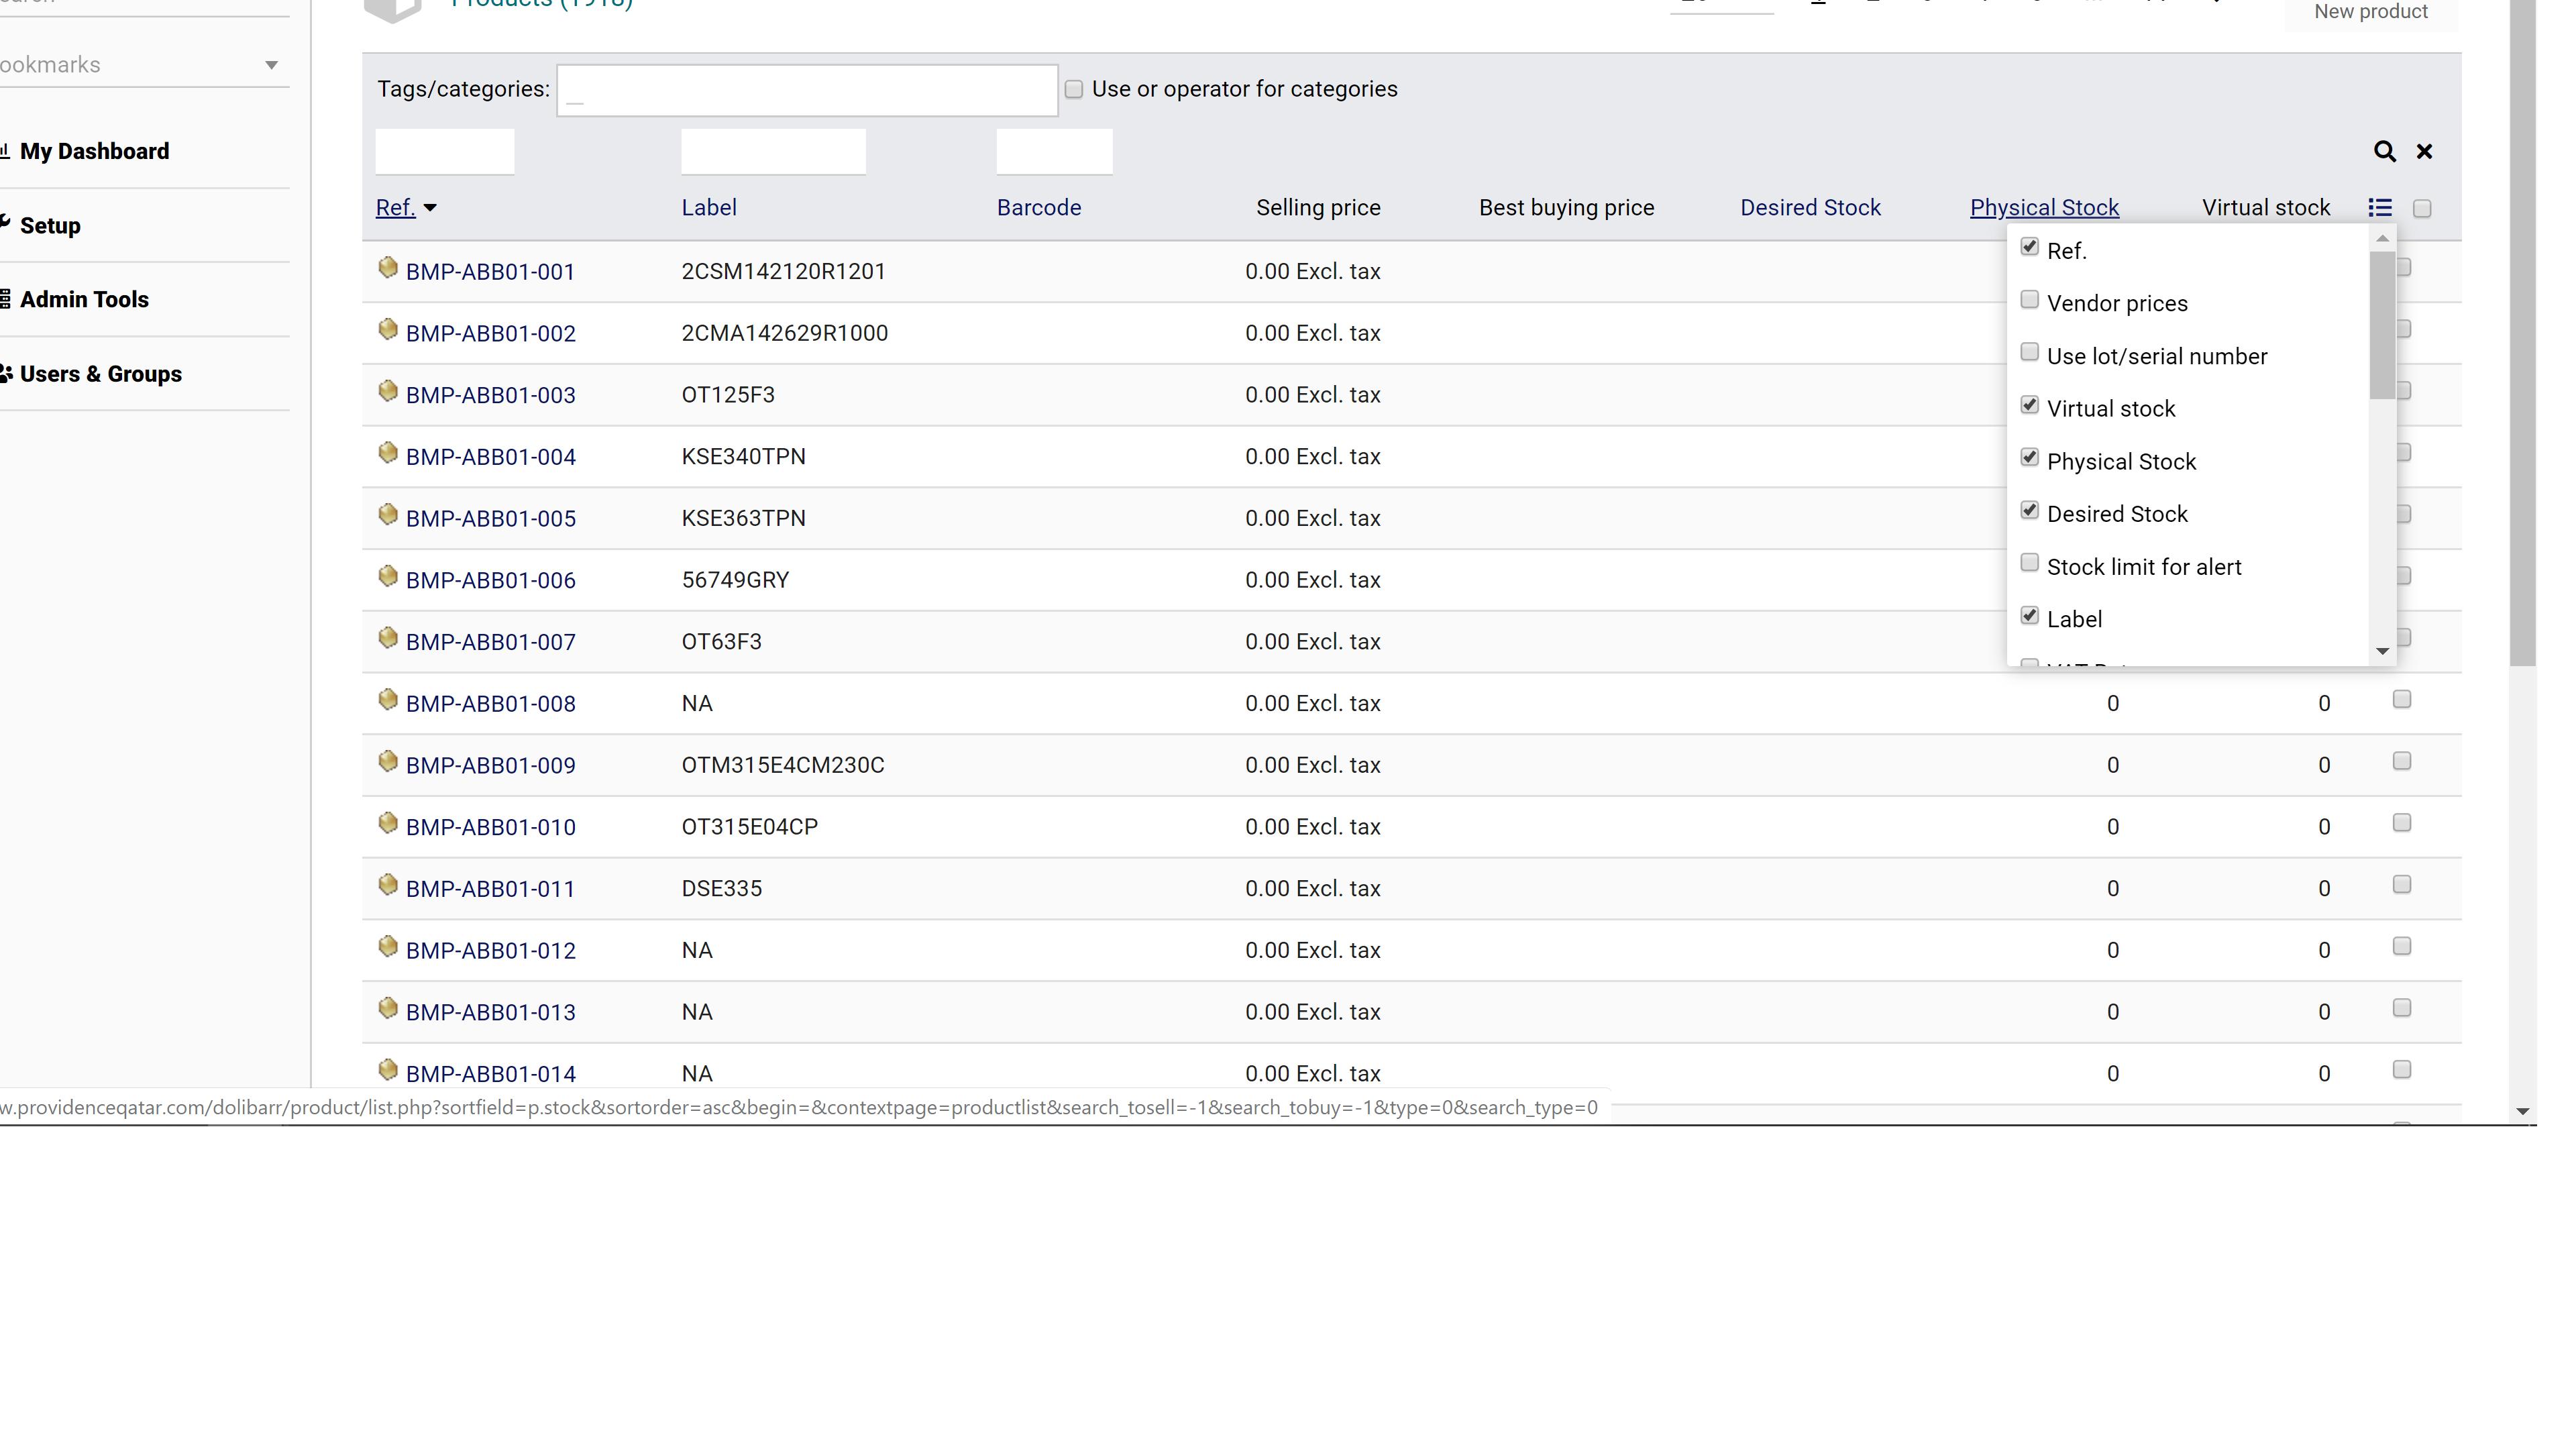 Product list search or list by Description - Using my Dolibarr - Dolibarr  international forum